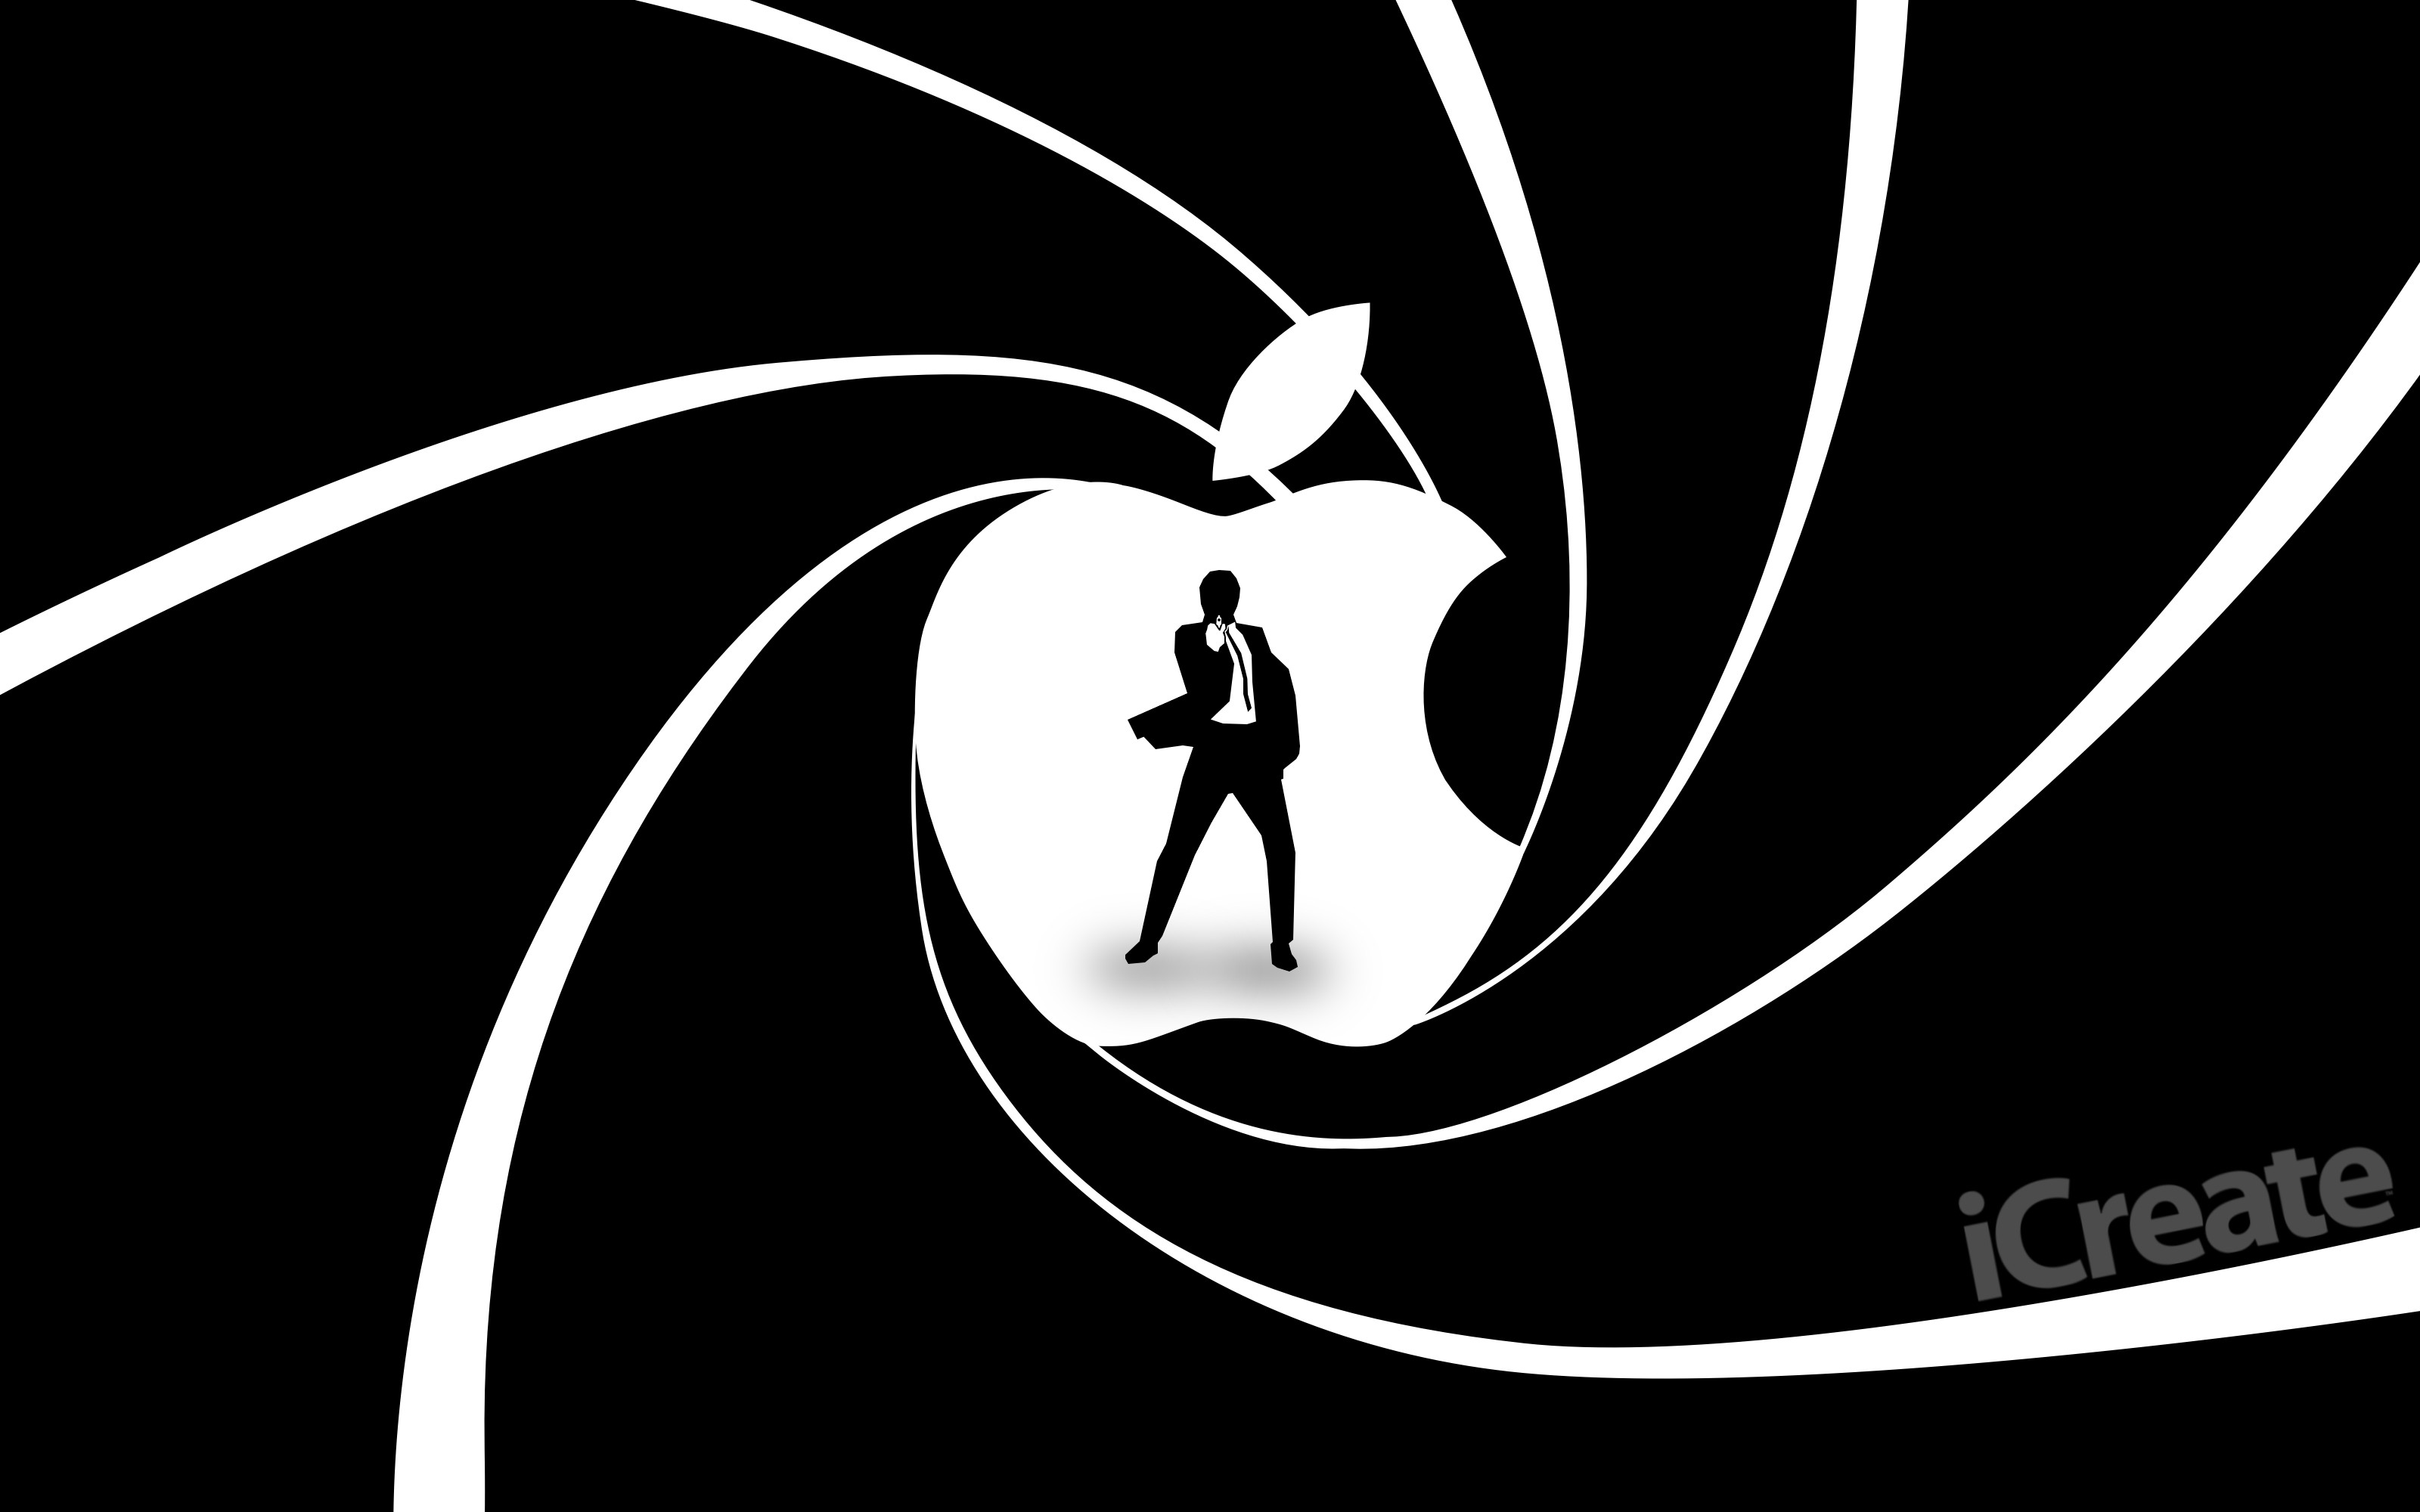 James bond iphone wallpaper 72 images - James bond wallpaper iphone 5 ...